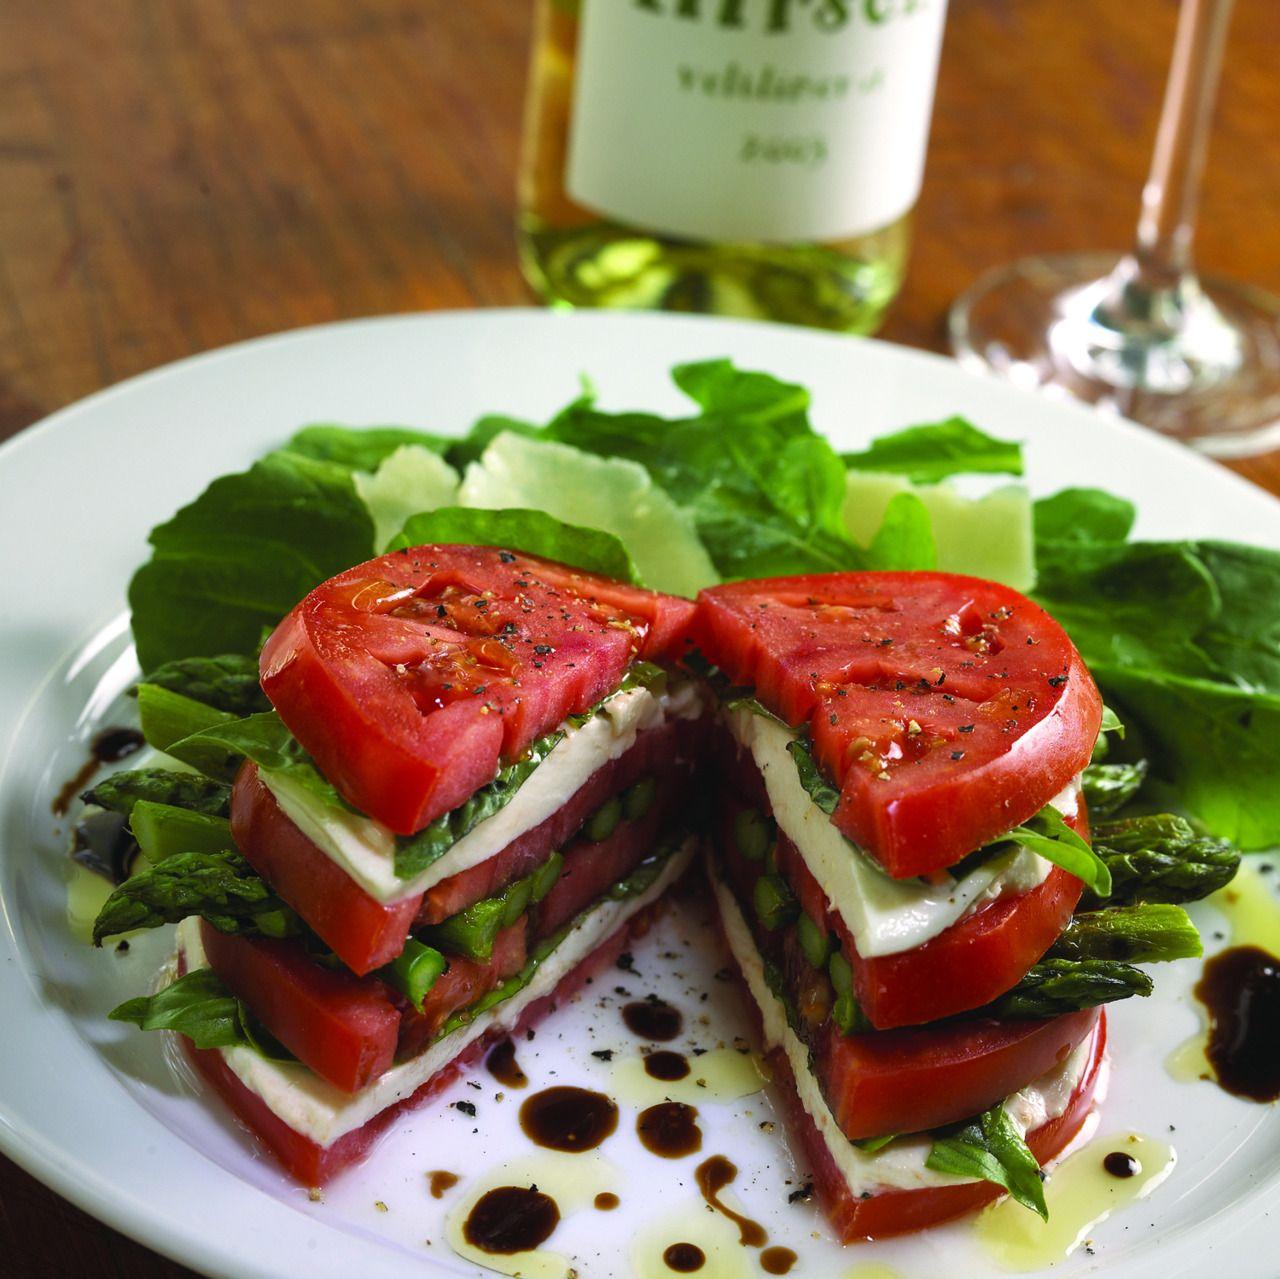 stacked buffalo mozzarella, ripe tomatos, asparagus, basil, balsamic vinaigrette & olive oil, fresh cracked pepper